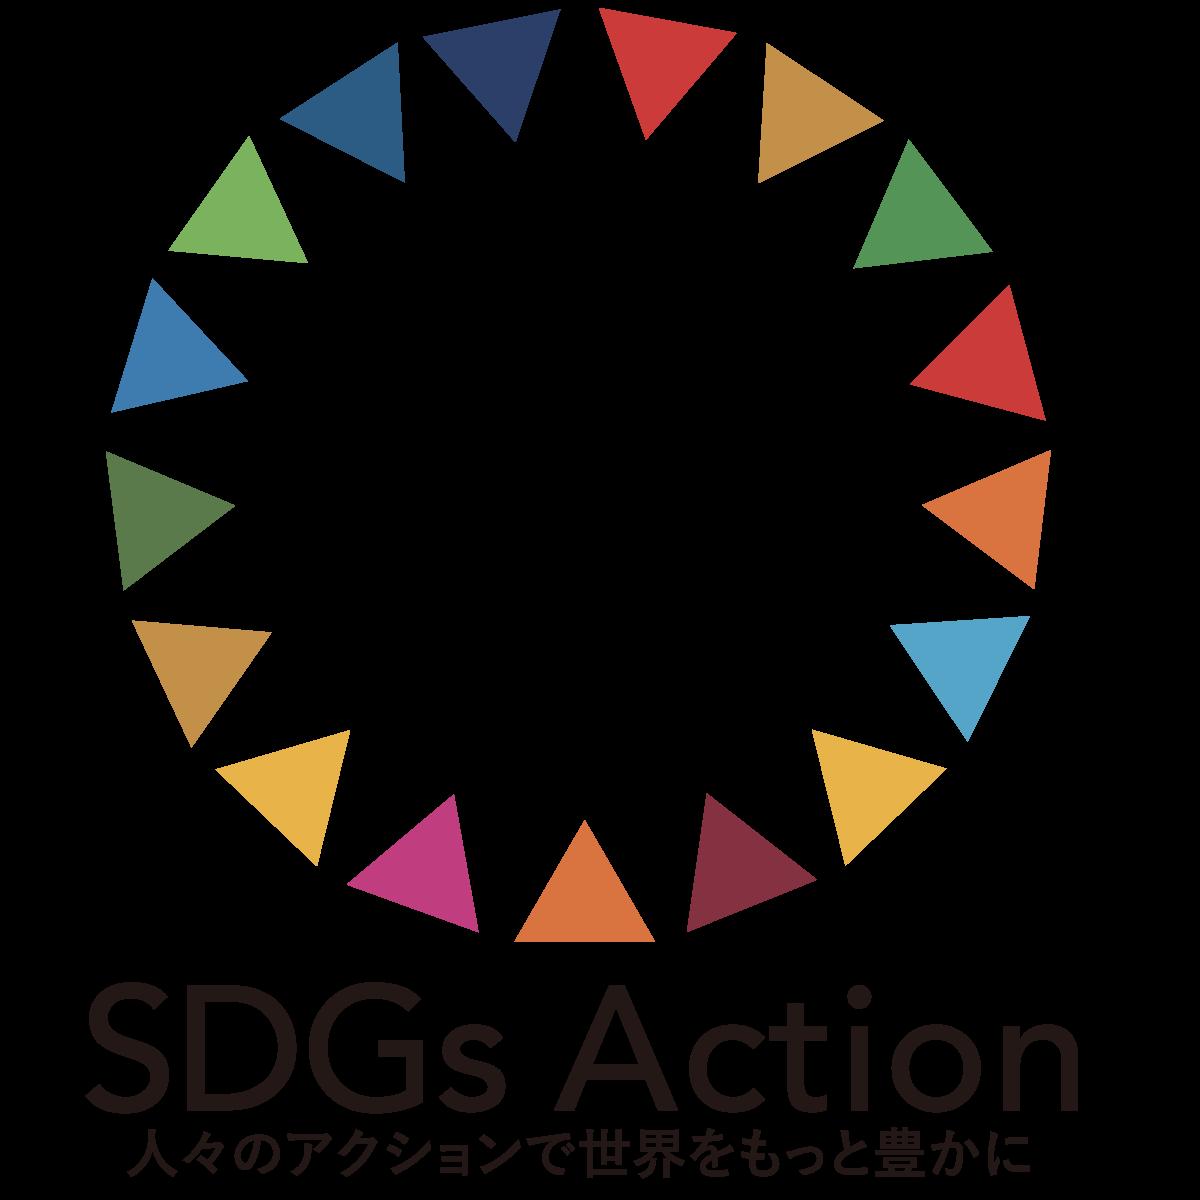 SDGsプロジェクト×クラウドファンディングの新しい形 人々のアクションで世界をもっと豊かに「SDGs Action」2020年9月1日提供開始